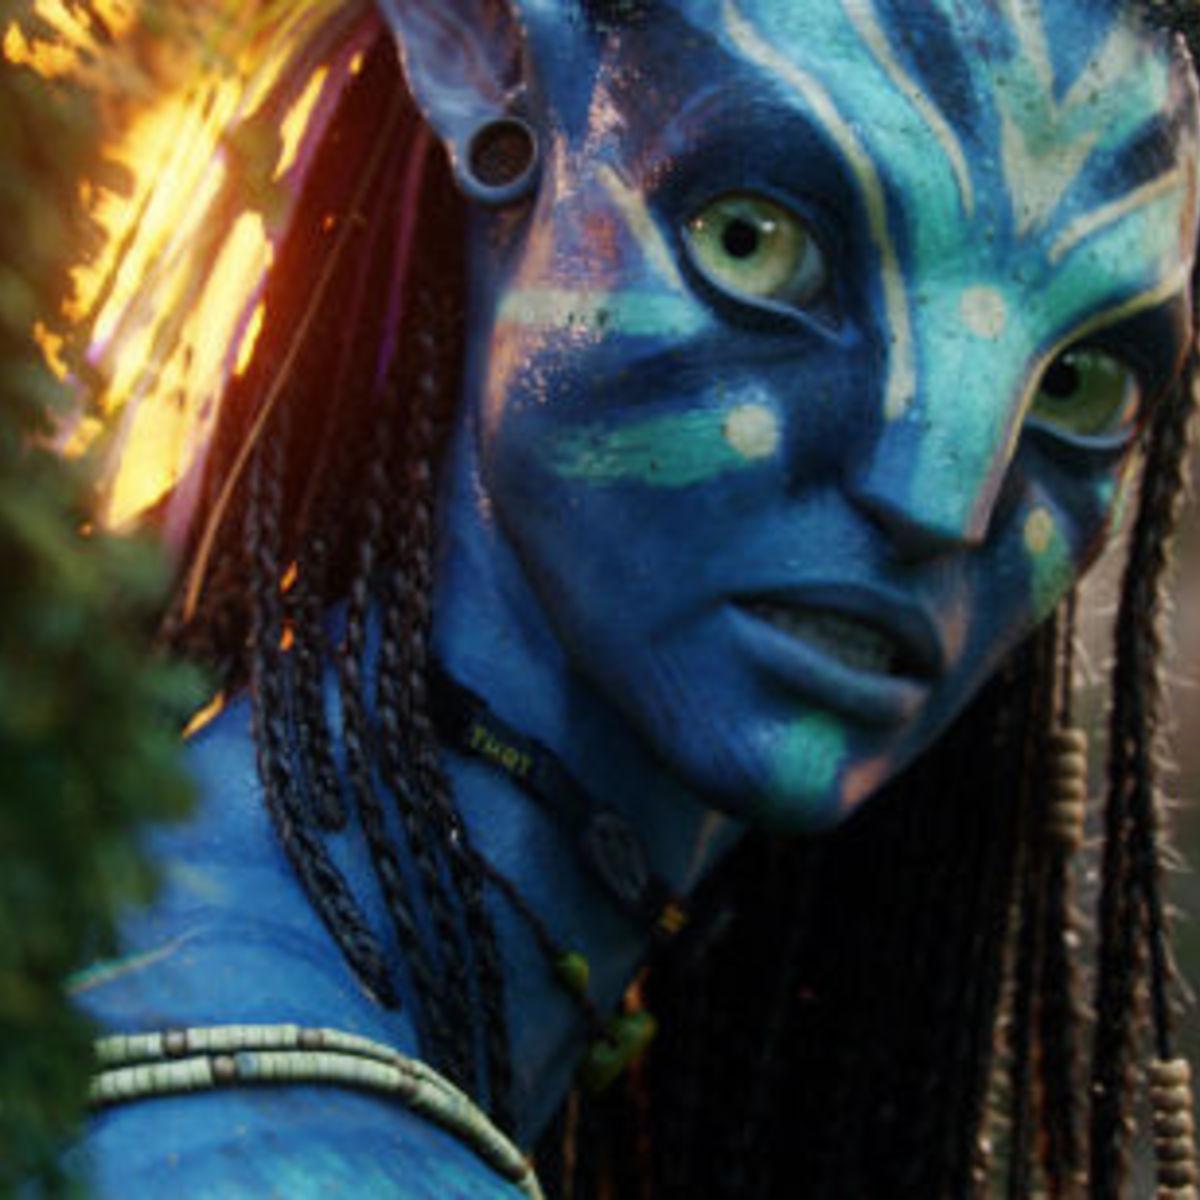 Avatar_neytiri_saldana_facepaint_6.jpg